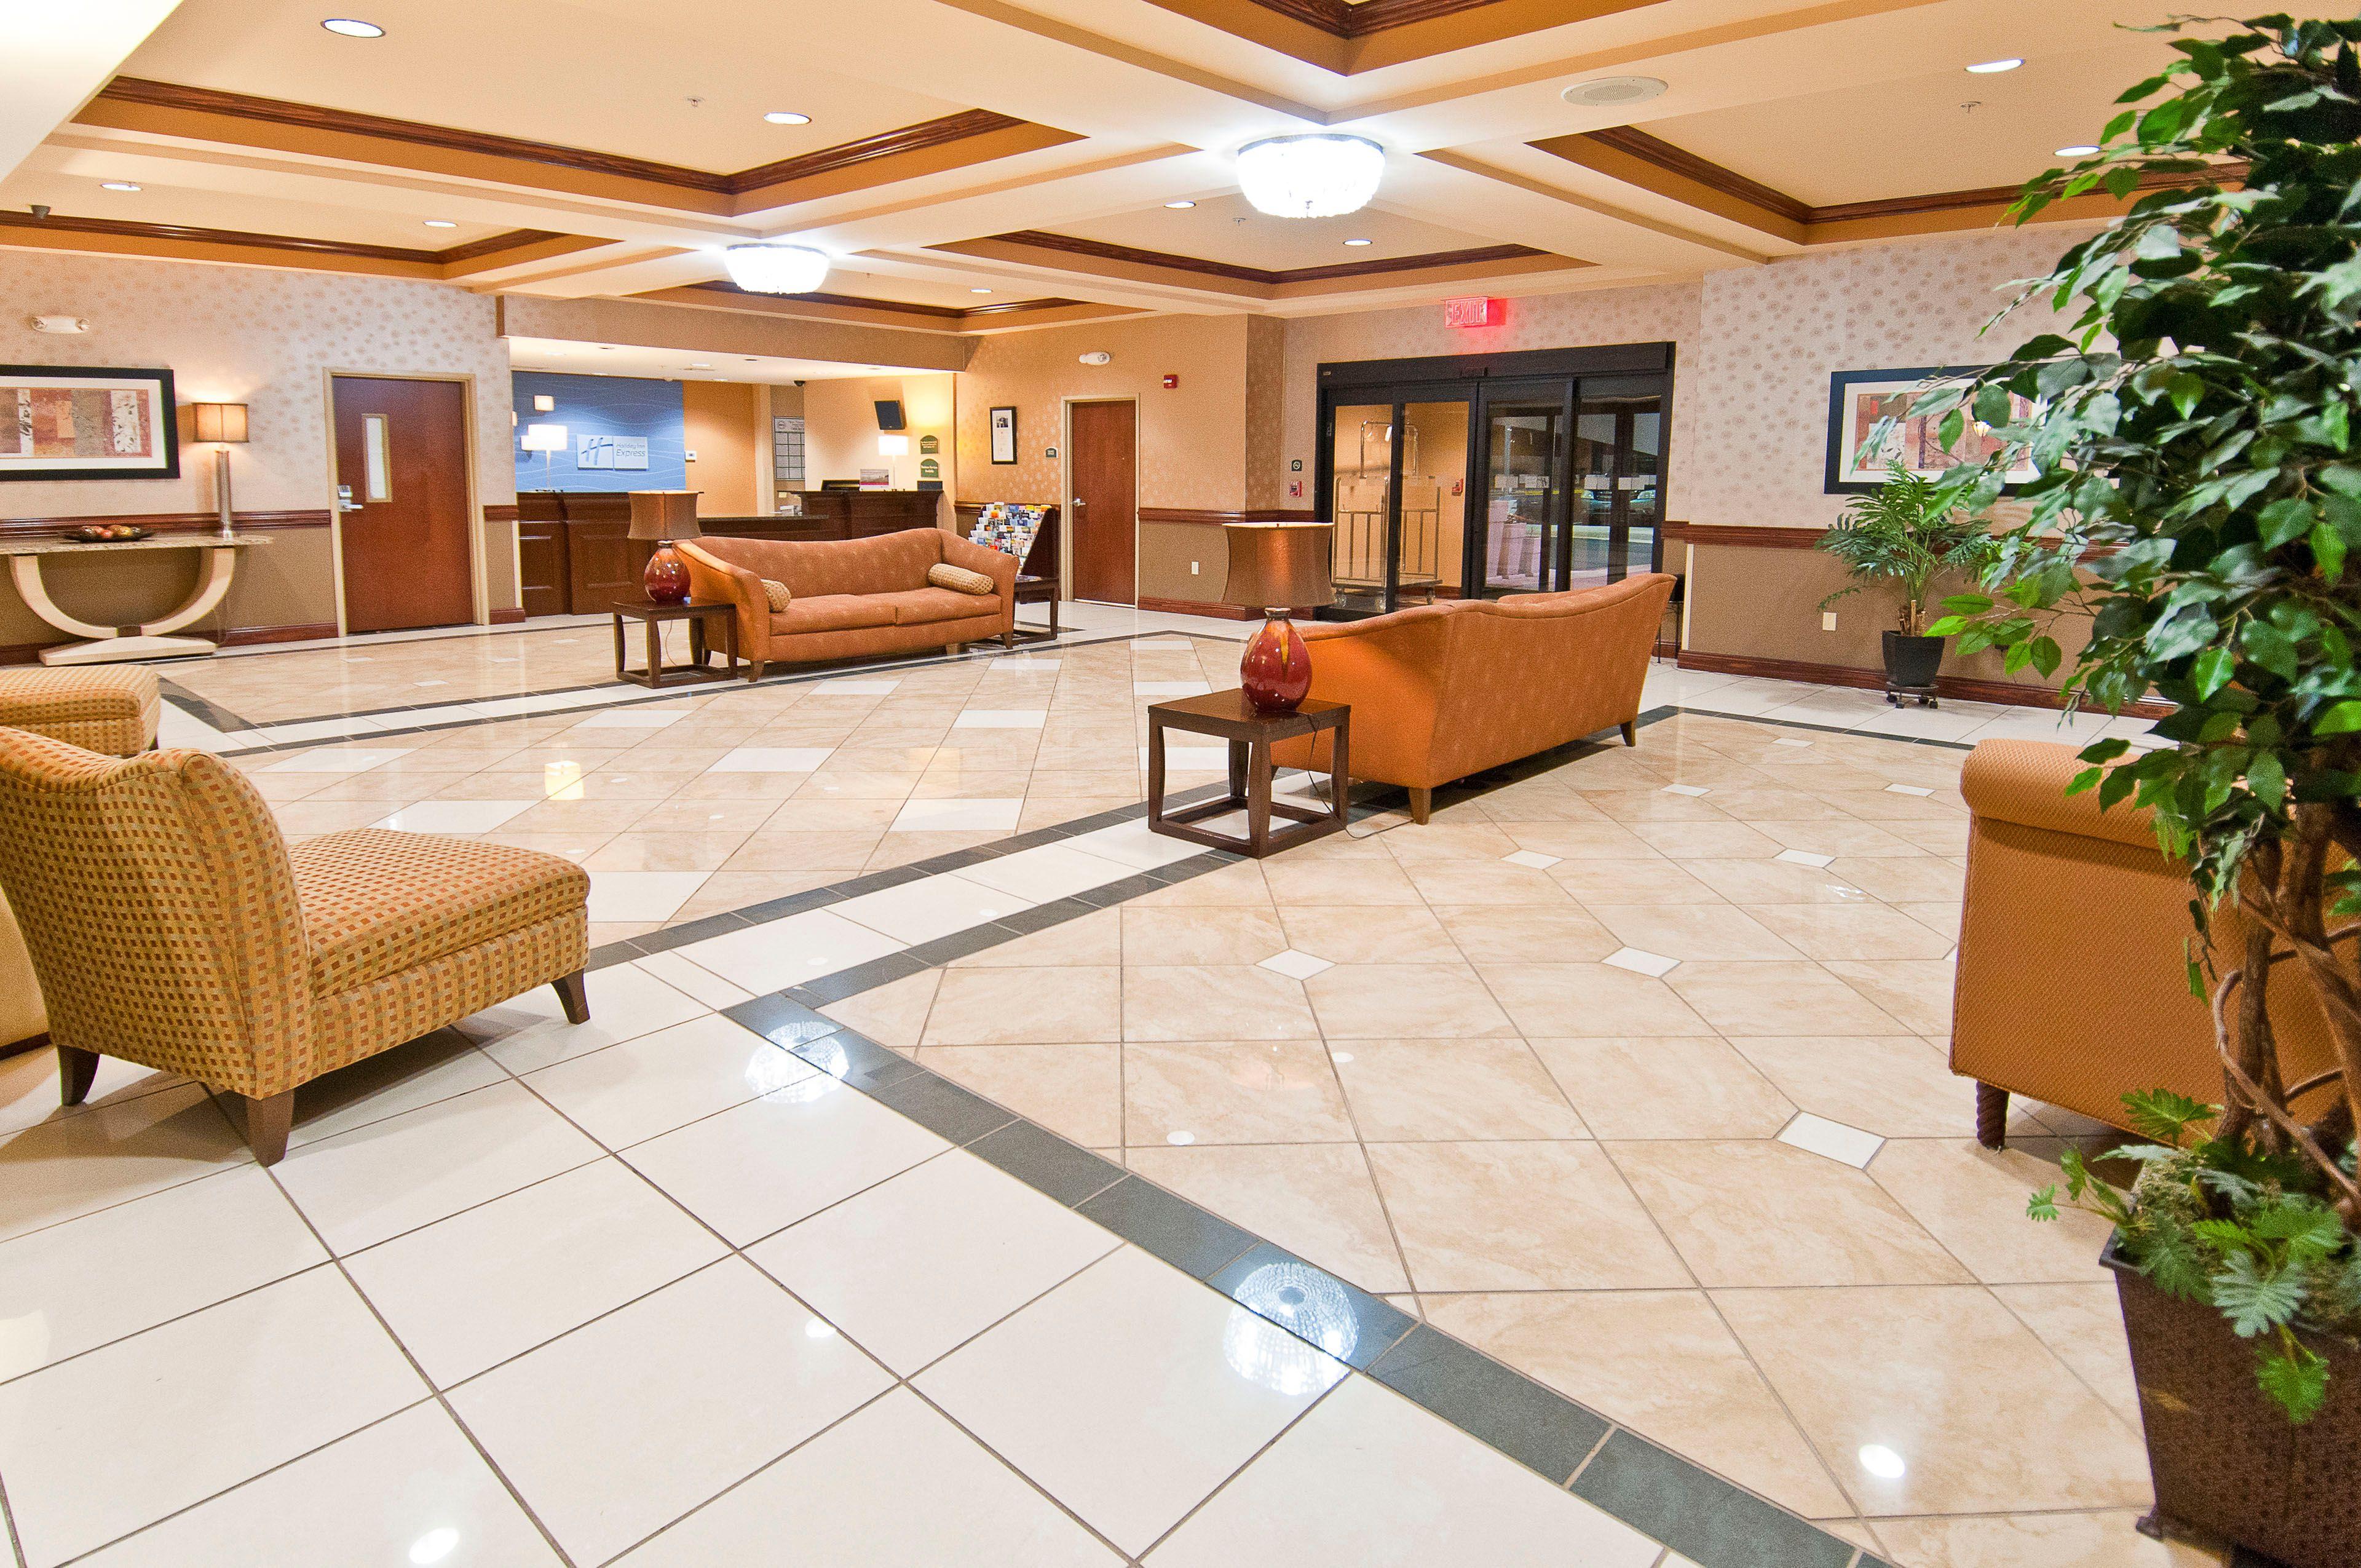 Holiday Inn Express & Suites Biloxi- Ocean Springs image 8